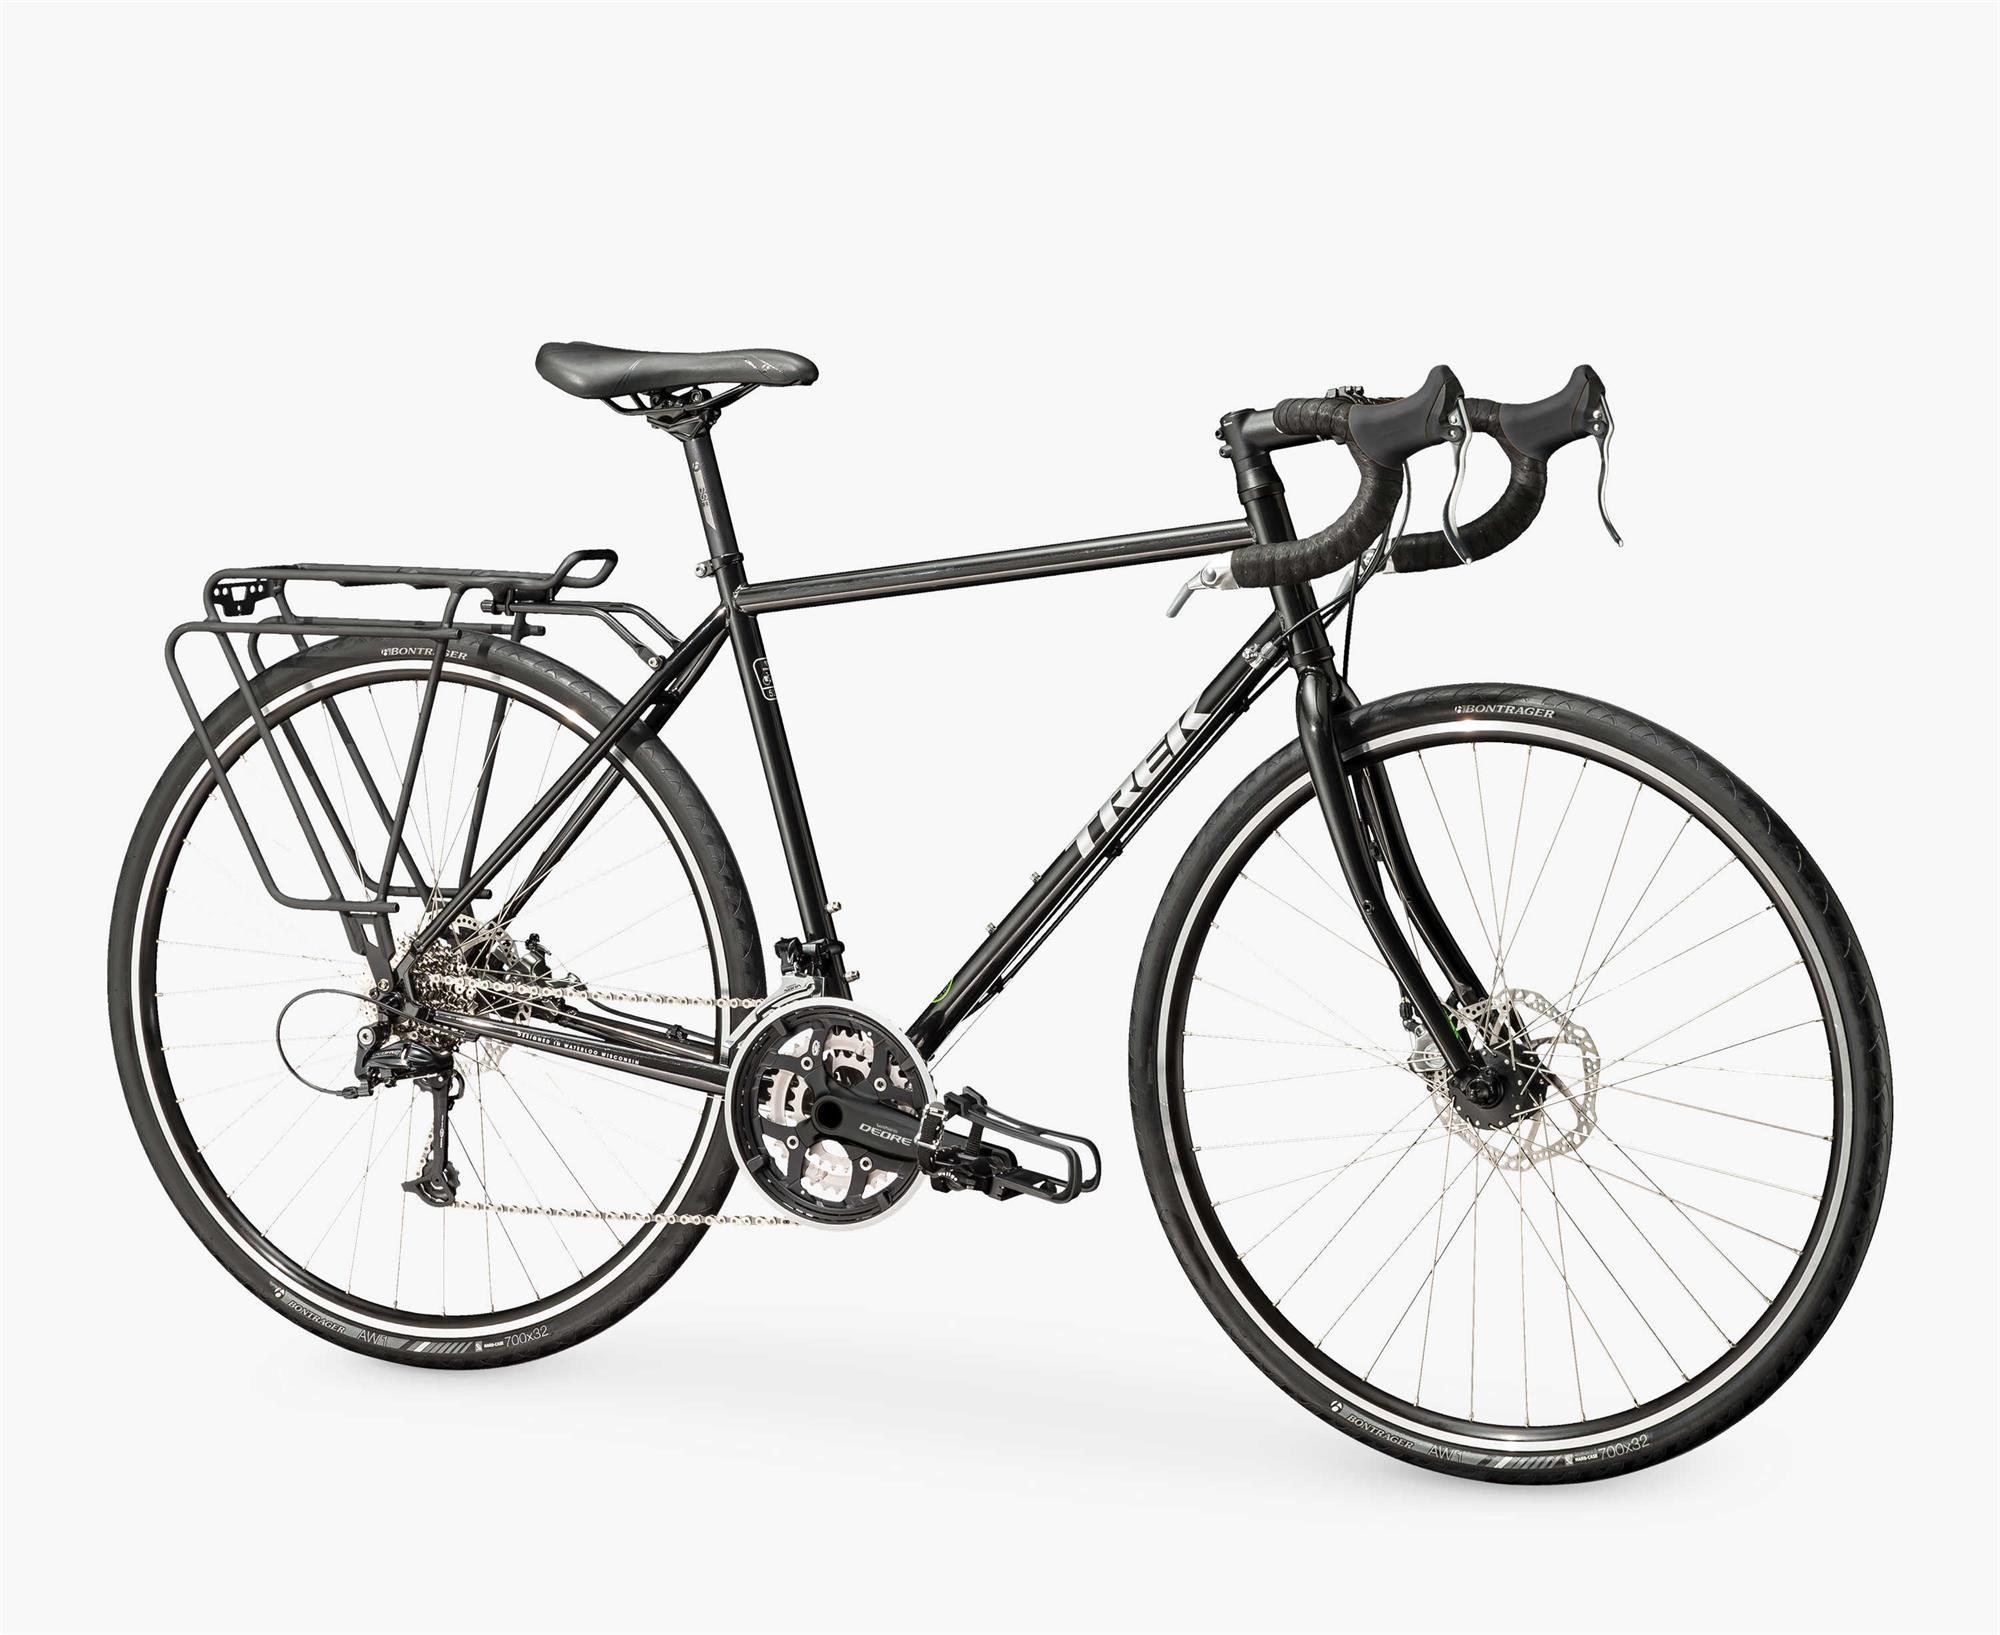 Trek 520 Disc Touring Cykel - Turcykel